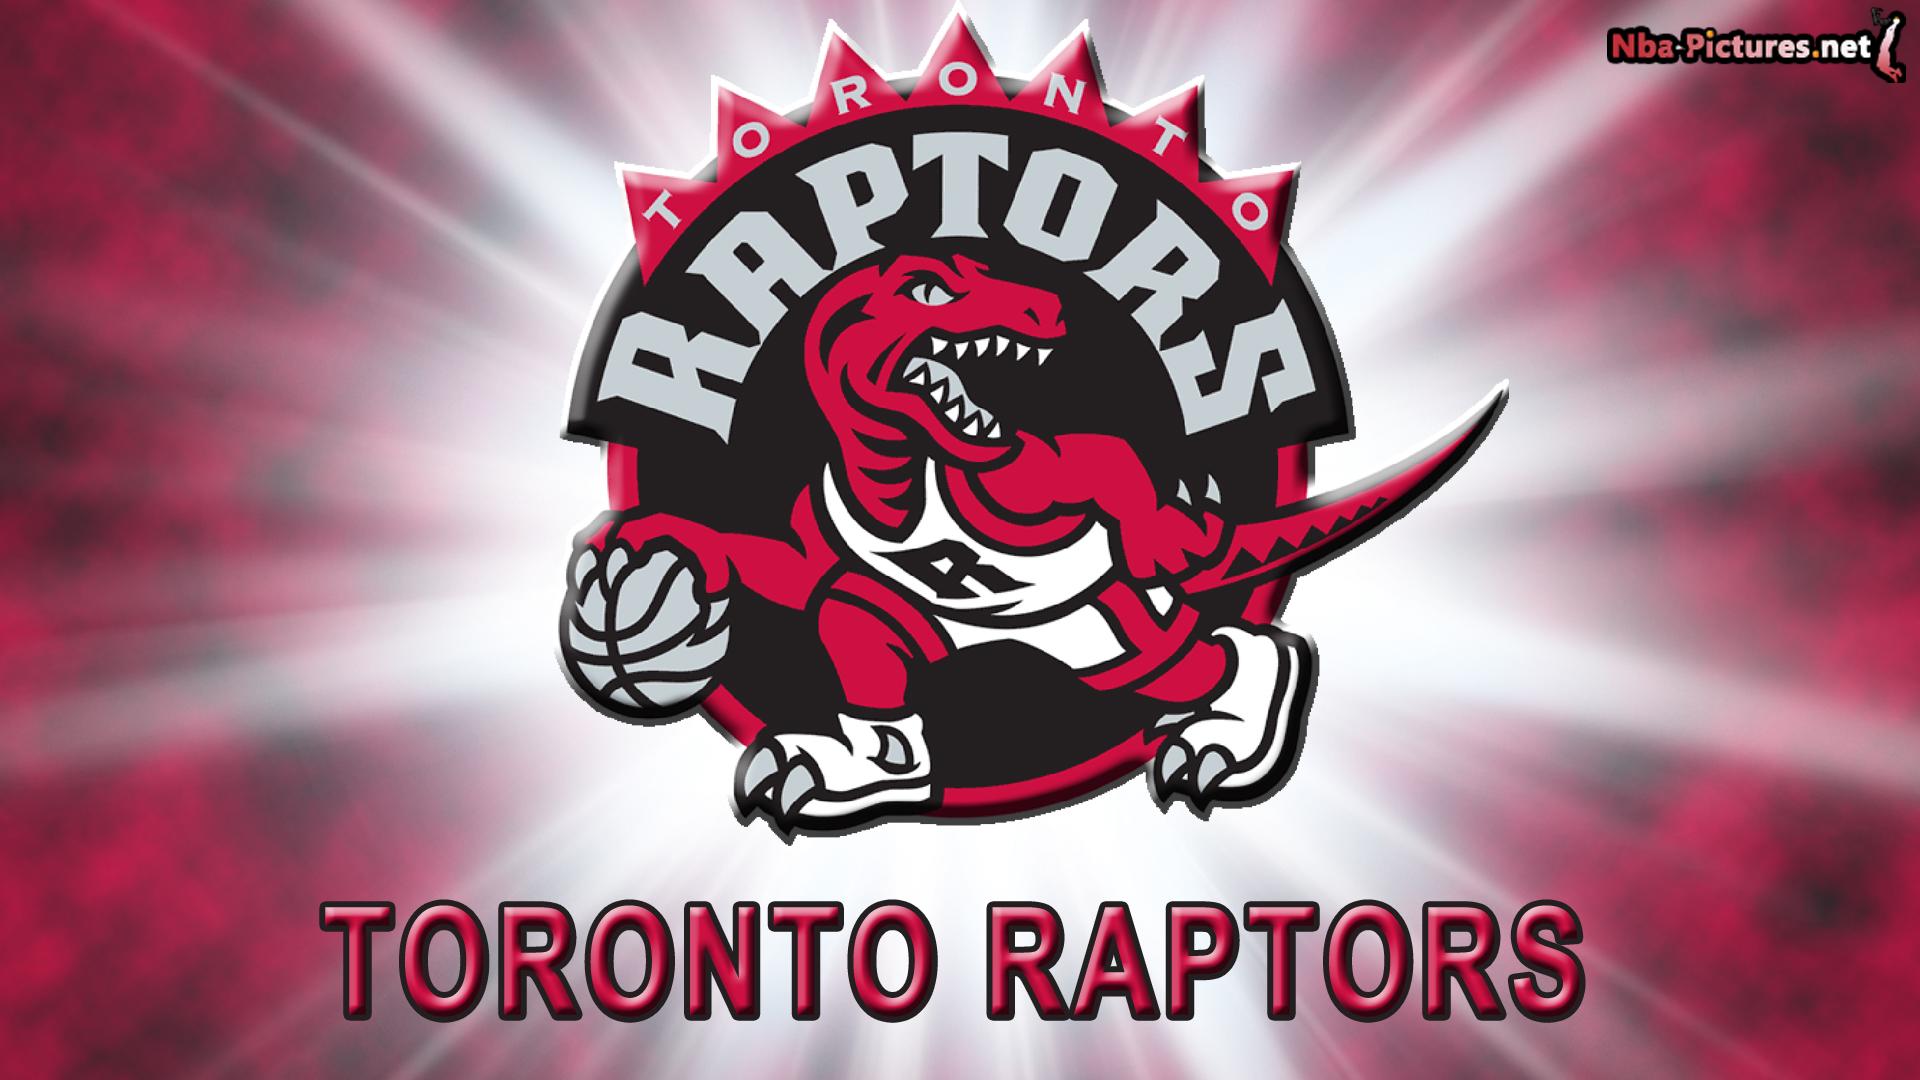 Toronto Raptors: Should The Toronto Raptors Consider A Name Change?